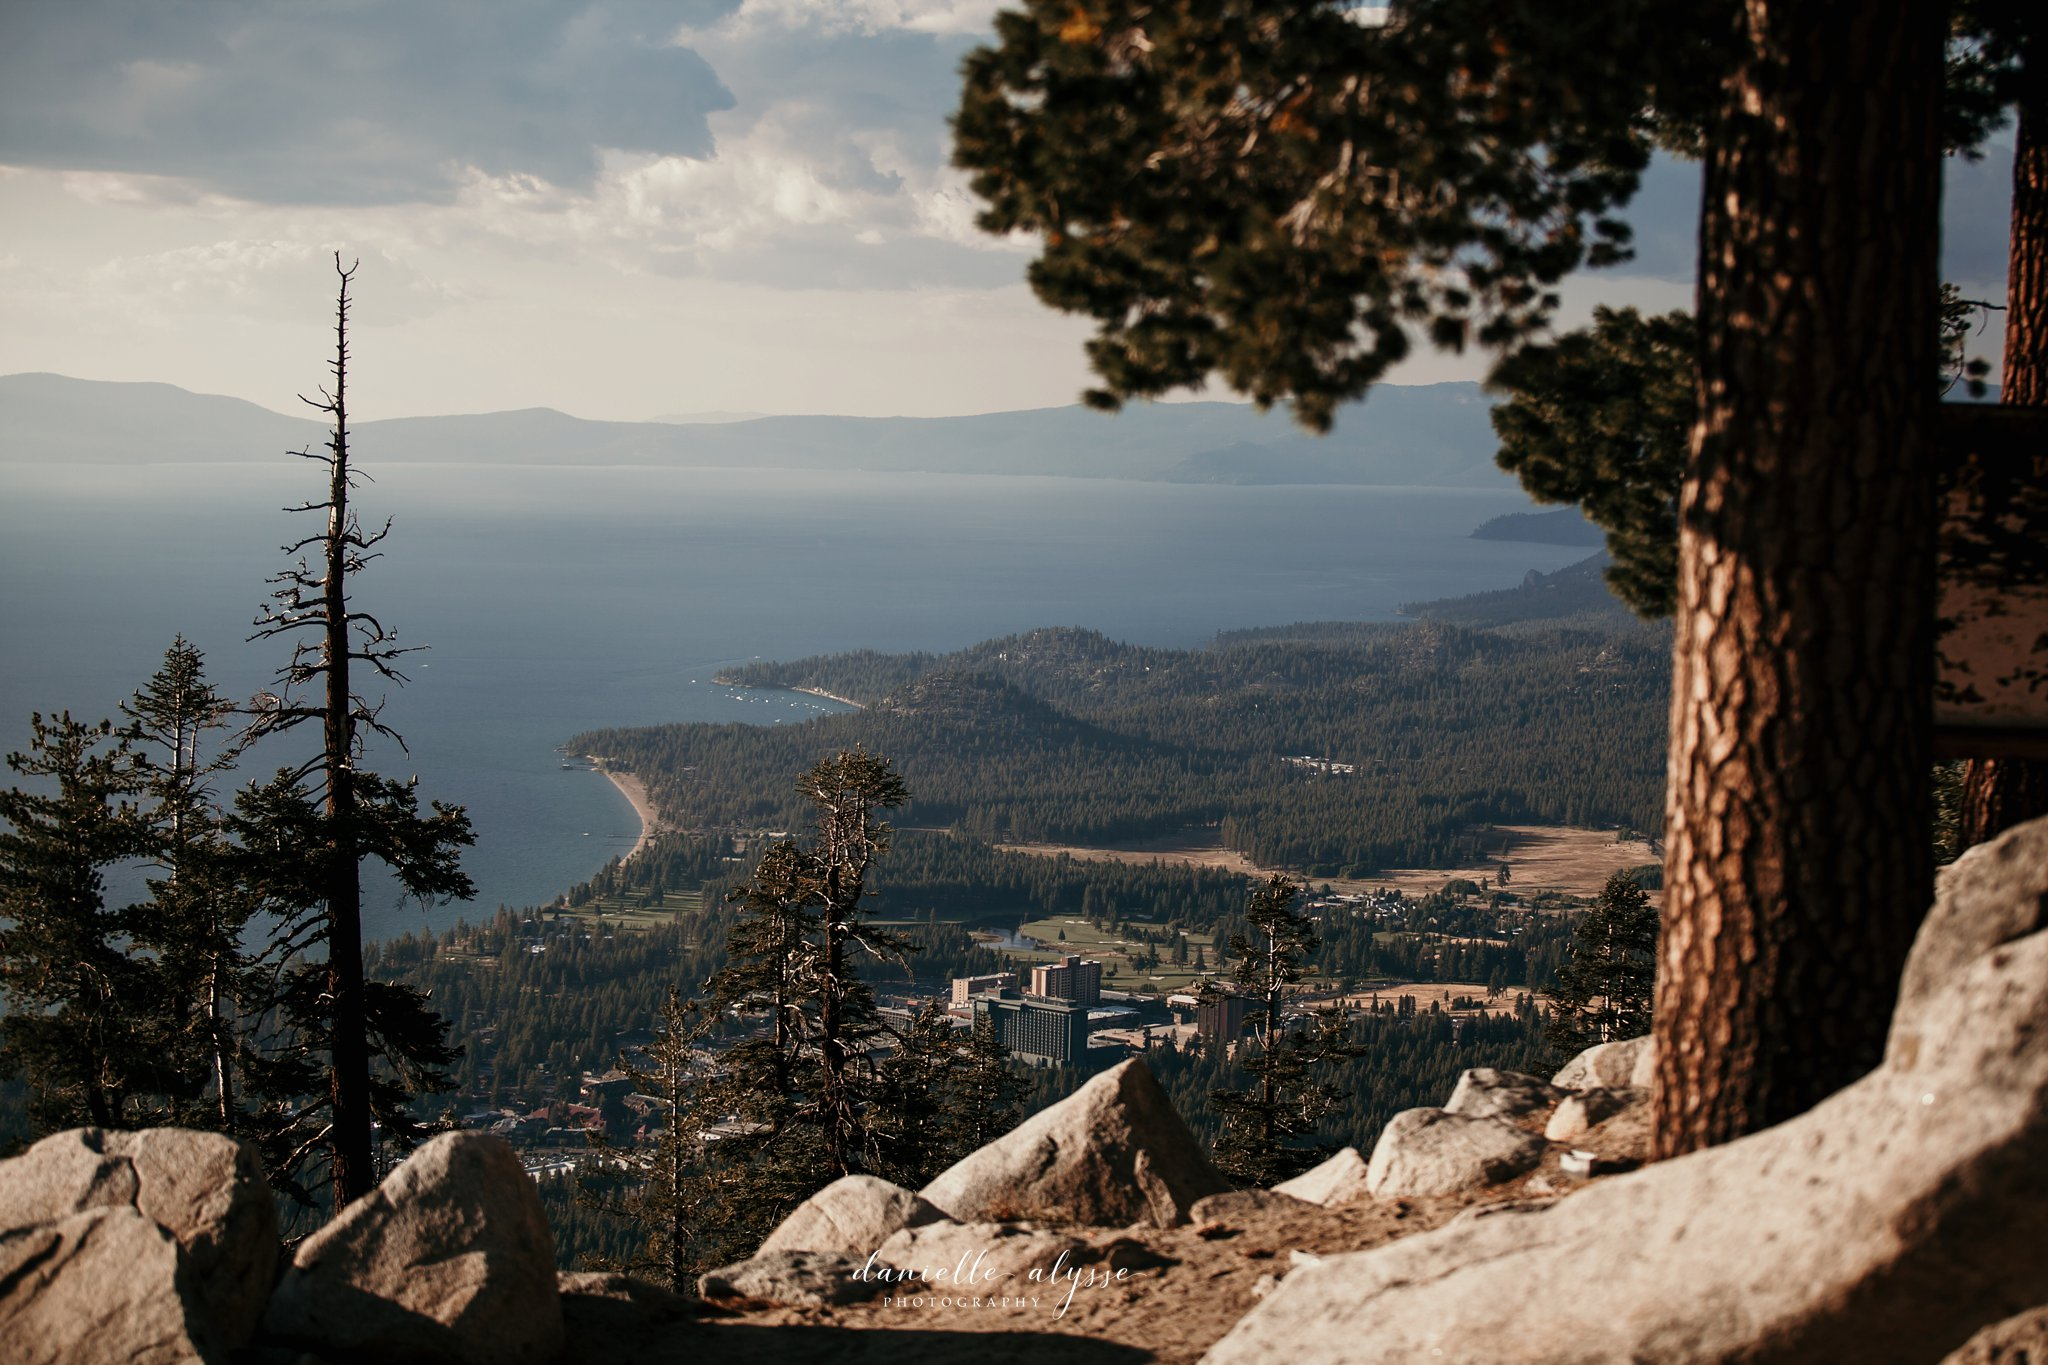 180831_wedding_stephanie_heavenly_south_lake_tahoe_danielle_alysse_photography_destination_blog_899_WEB.jpg